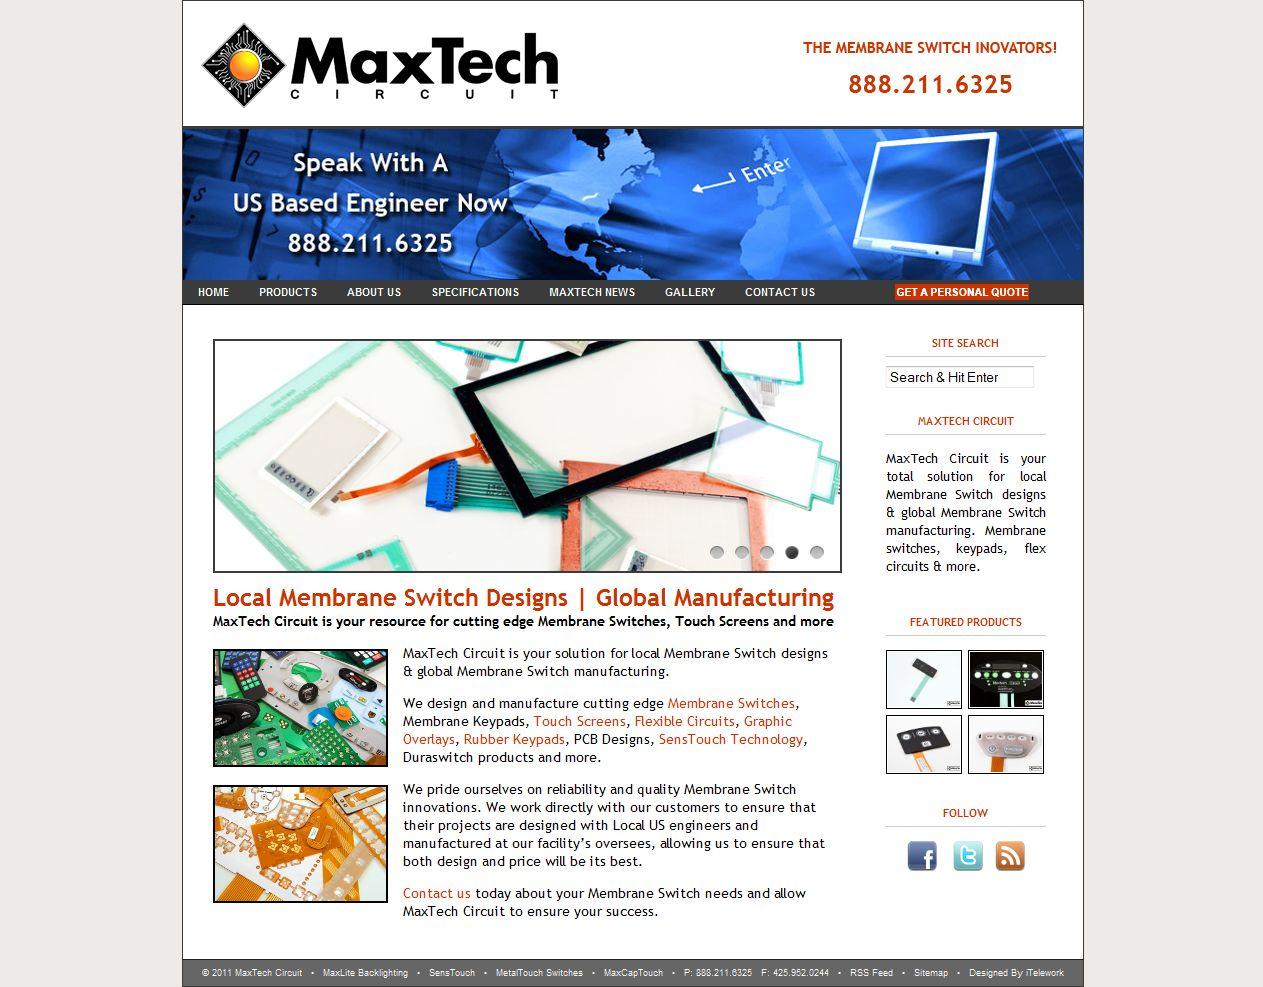 maxtechcircuit-com_